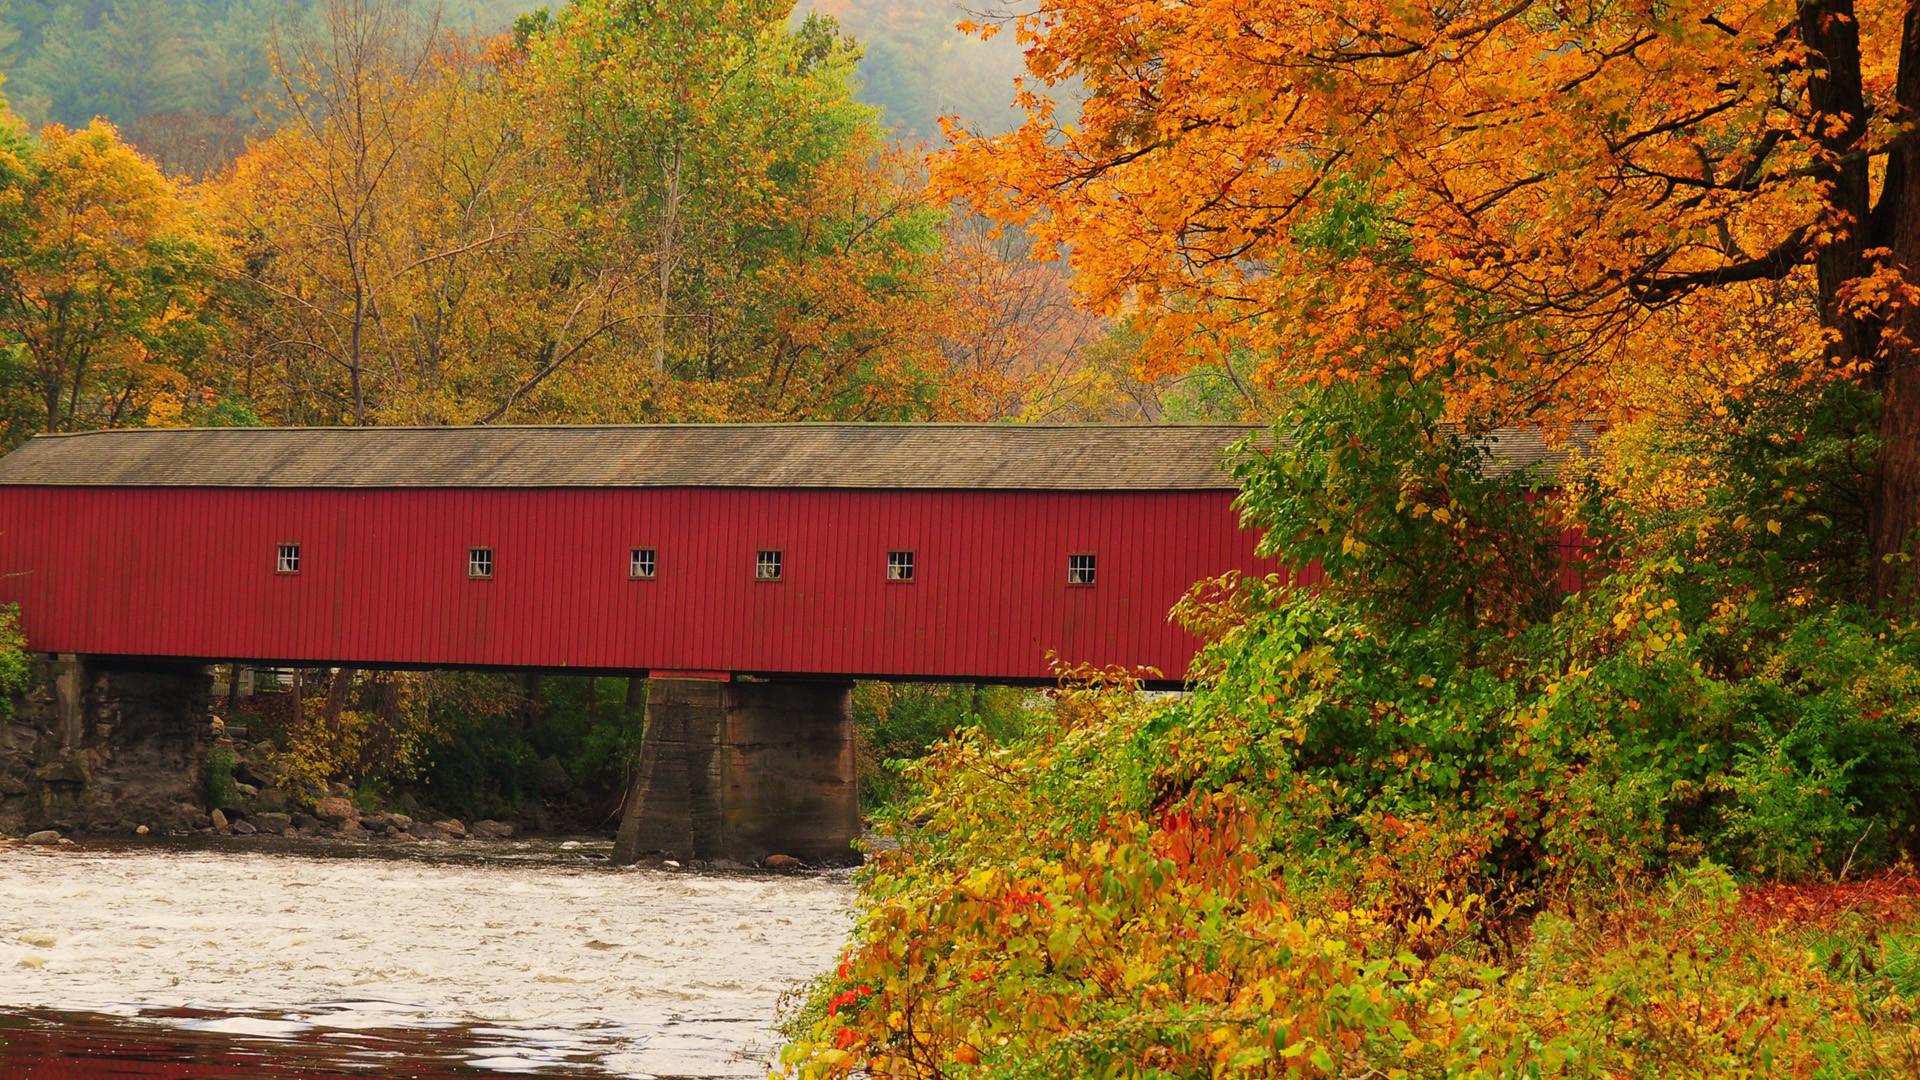 Fresh New Fall Hd Wallpapers New England Fall Wallpaper 183 ①